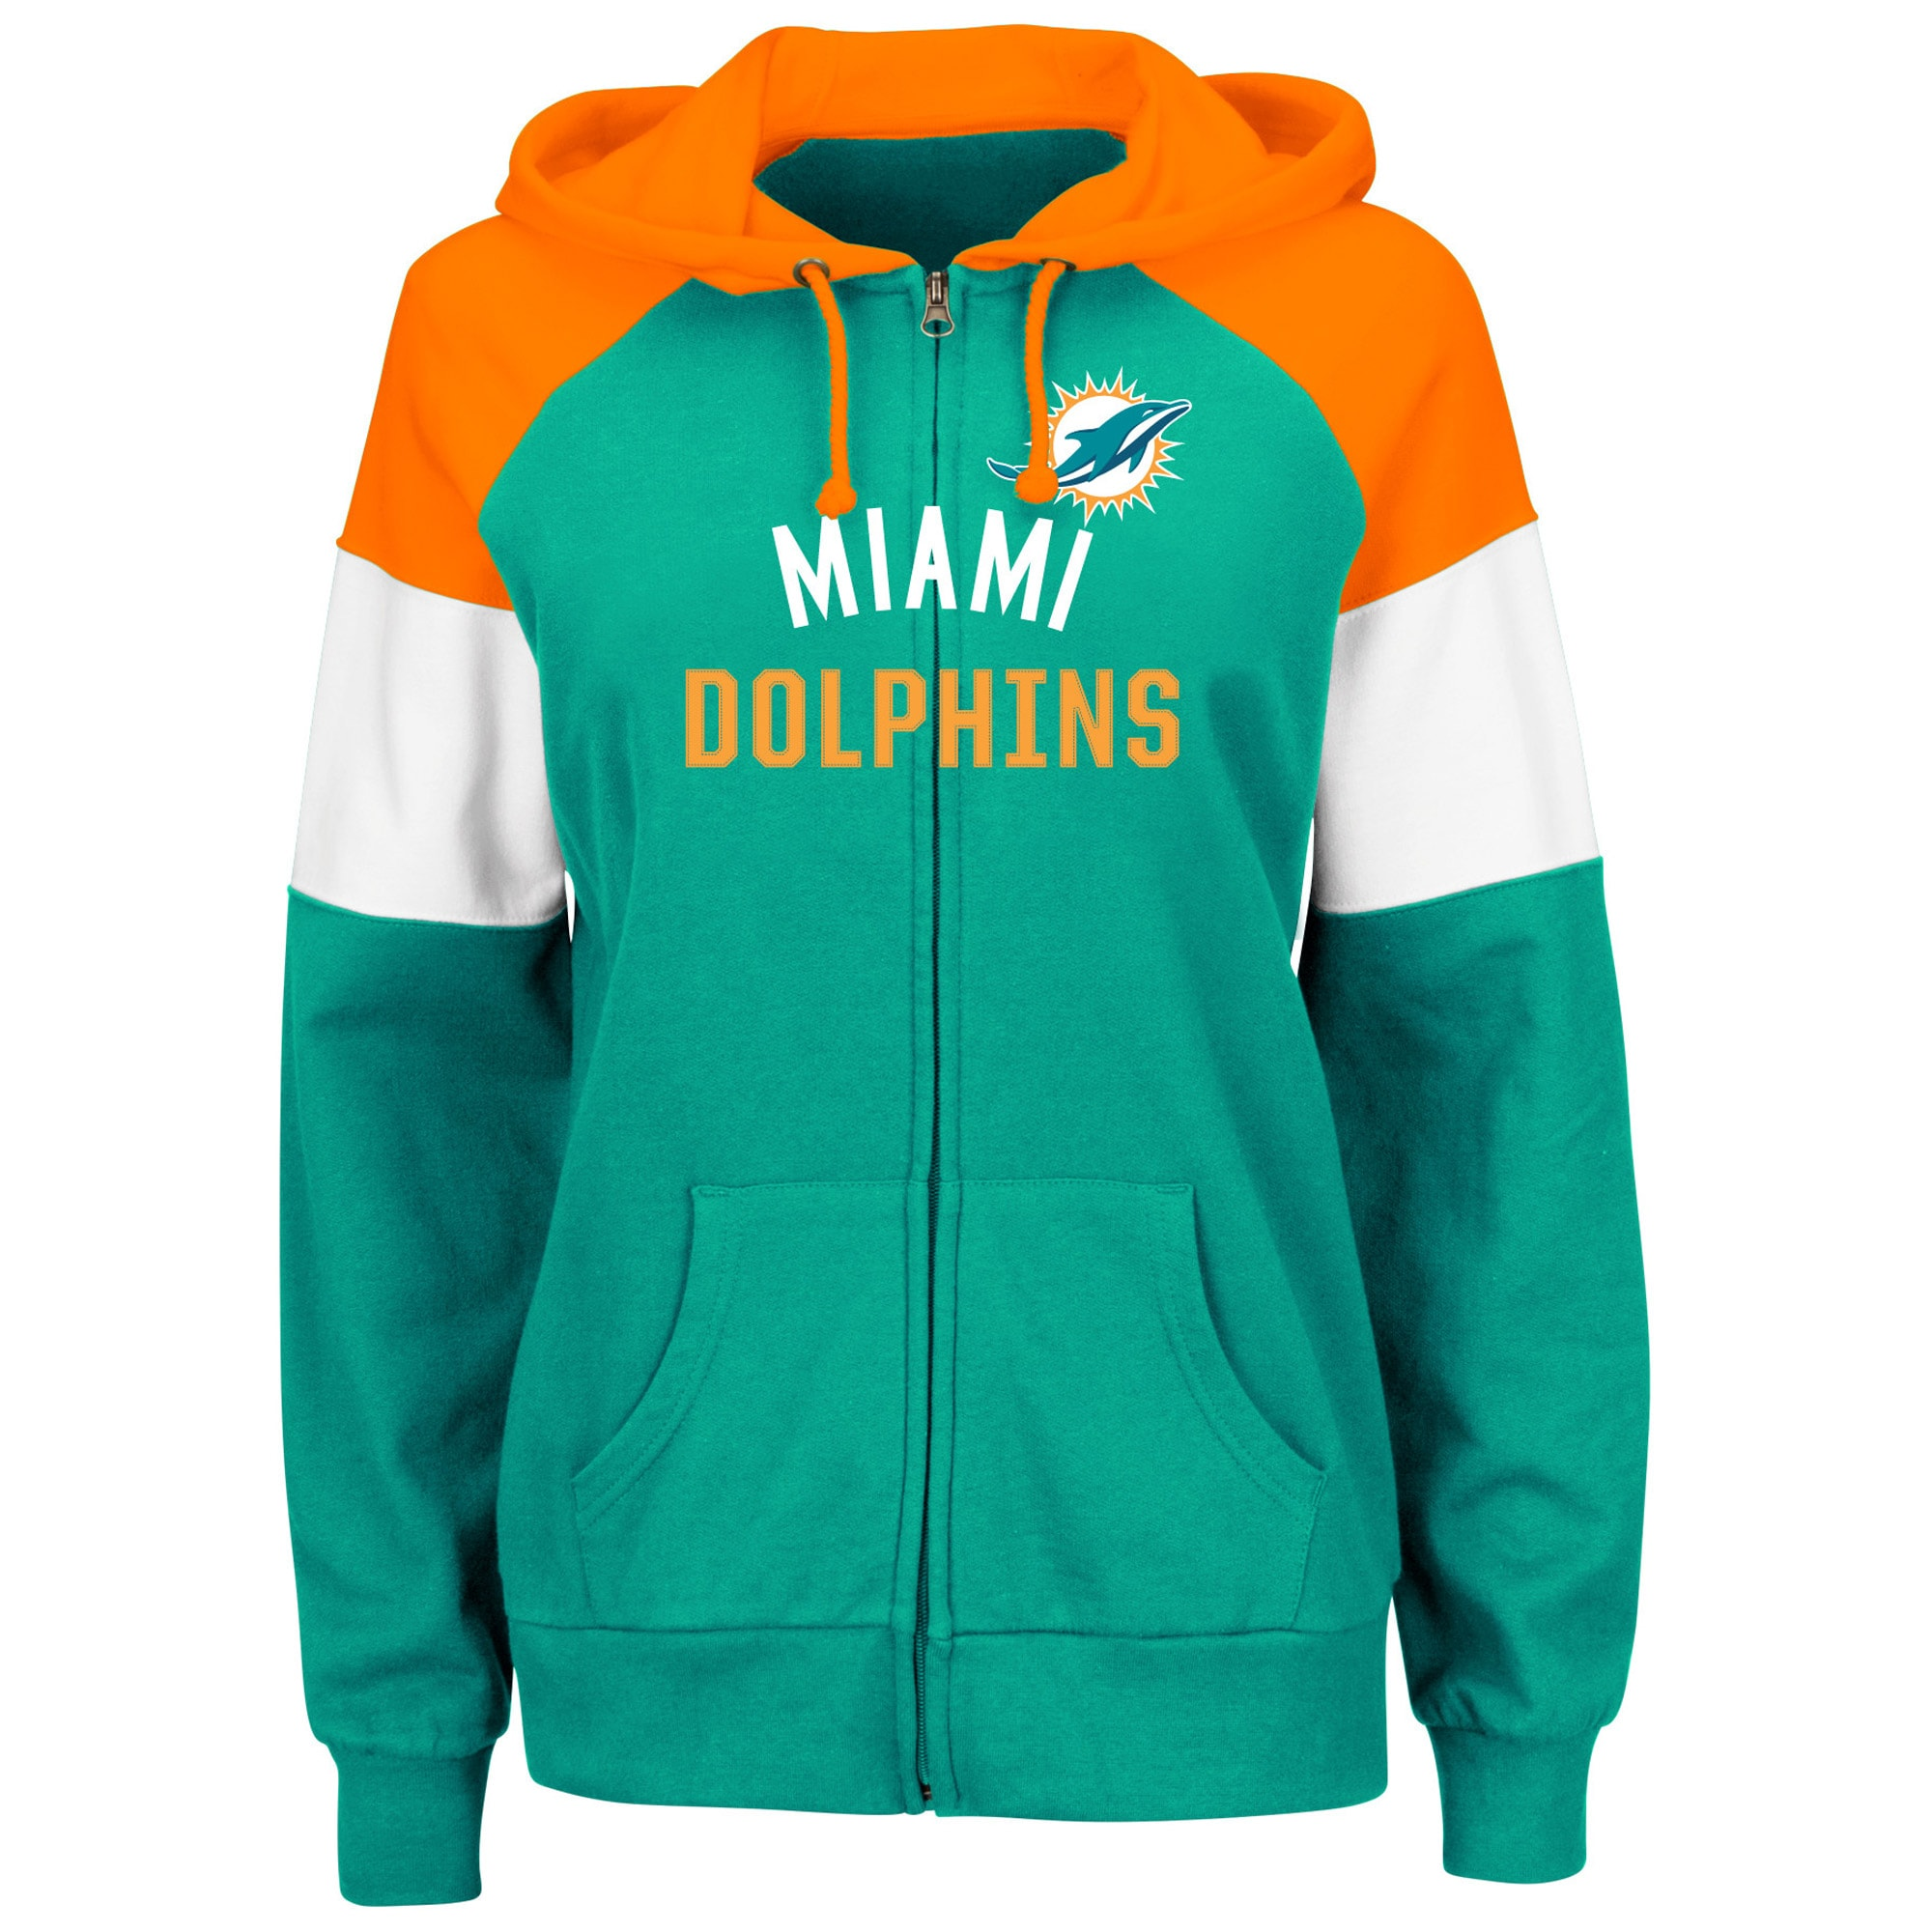 Miami Dolphins Majestic Women's Hot Route Full-Zip Hoodie - Aqua